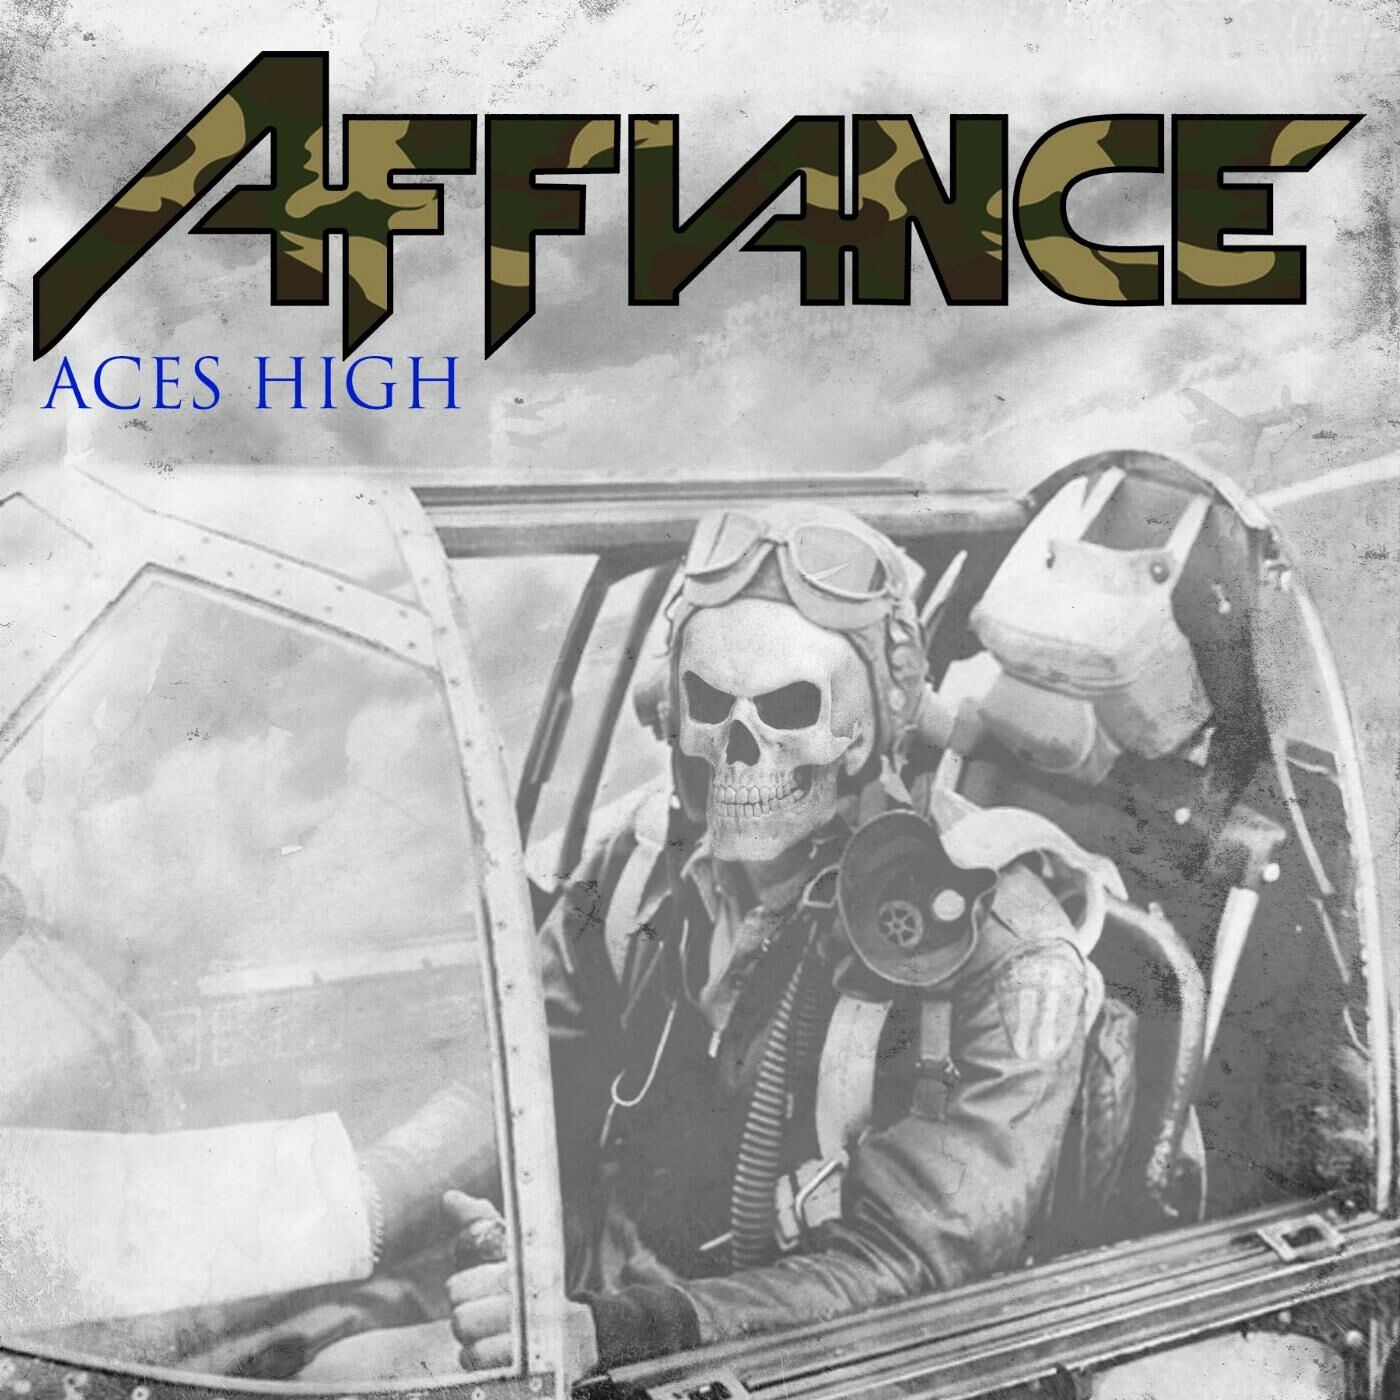 Affiance - Aces High [single] (2016)